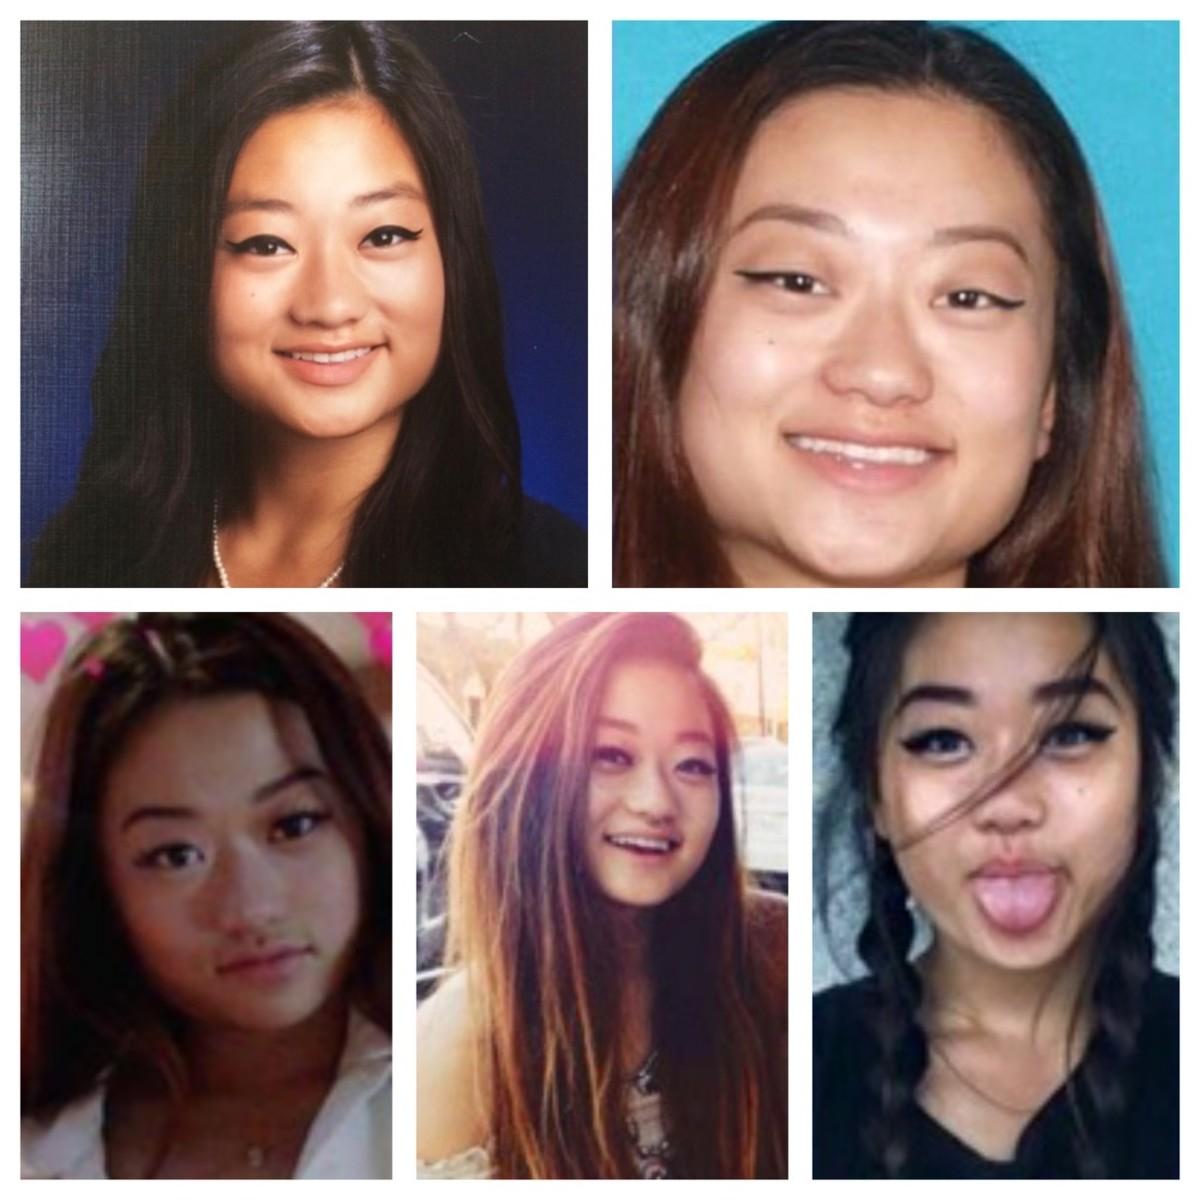 Missing: Elaine Park